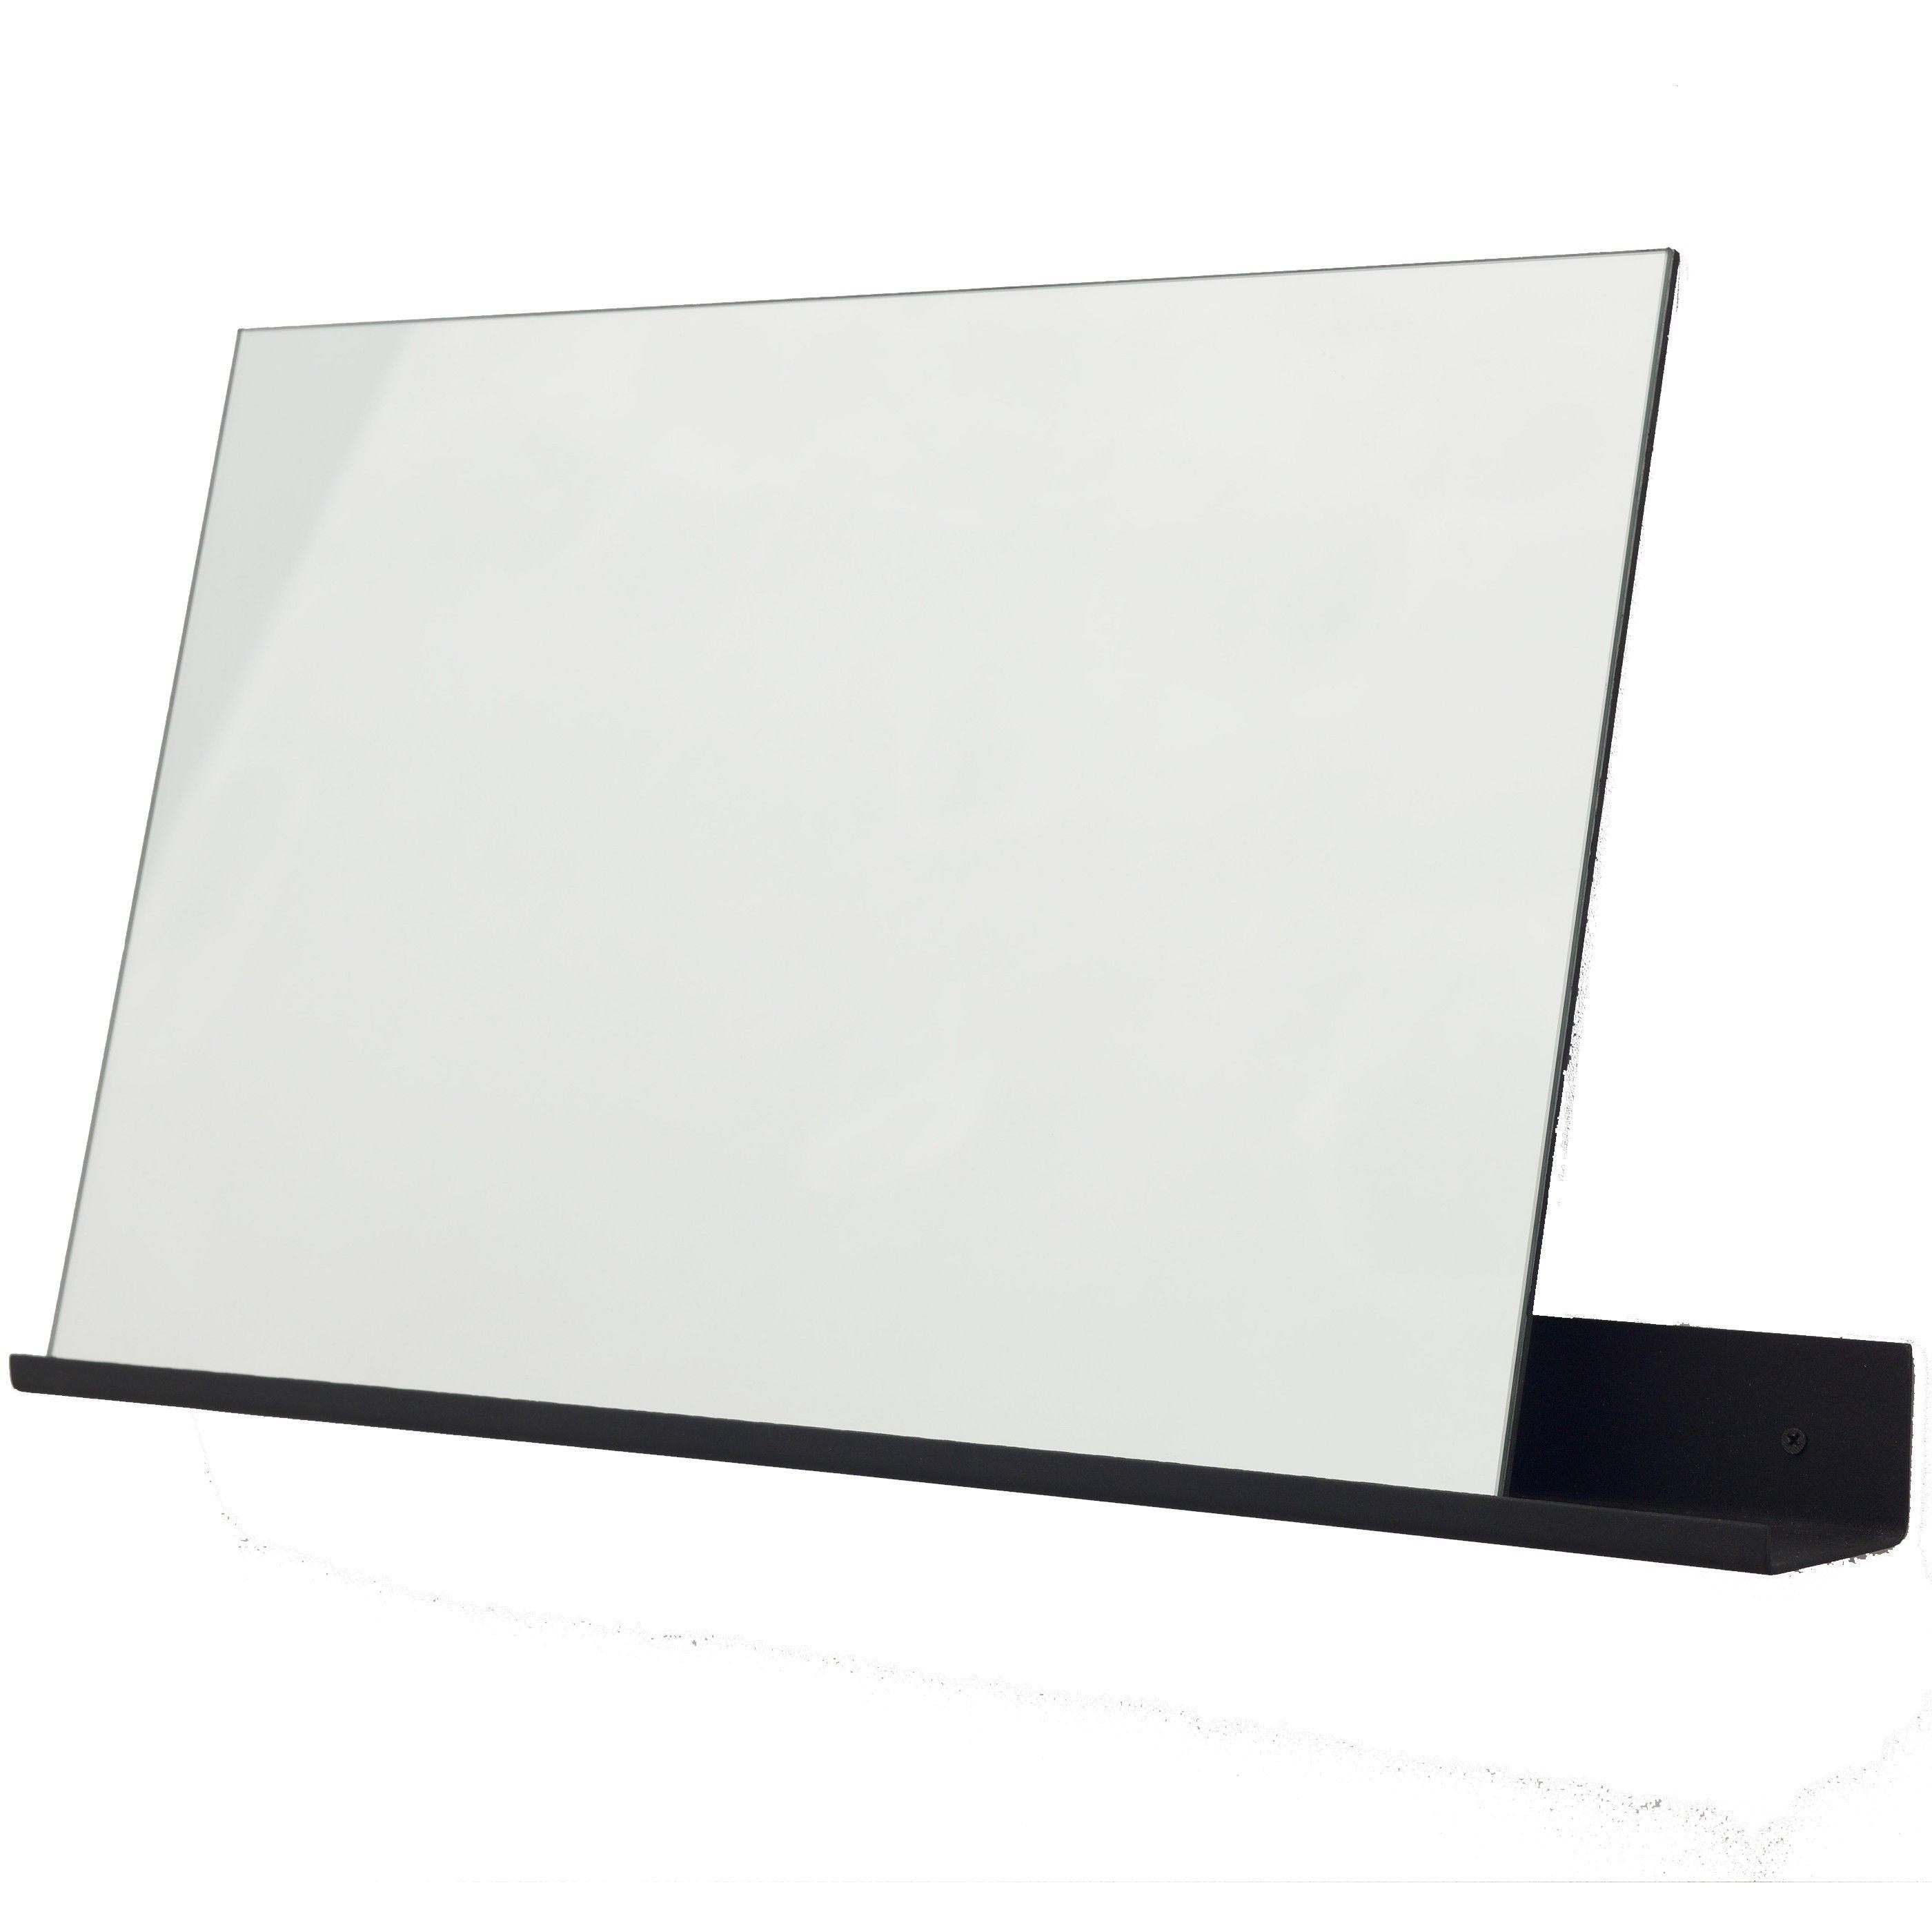 Frama mirror shelf spiegel 70x90 flinders verzendt gratis for Spiegel 70x90